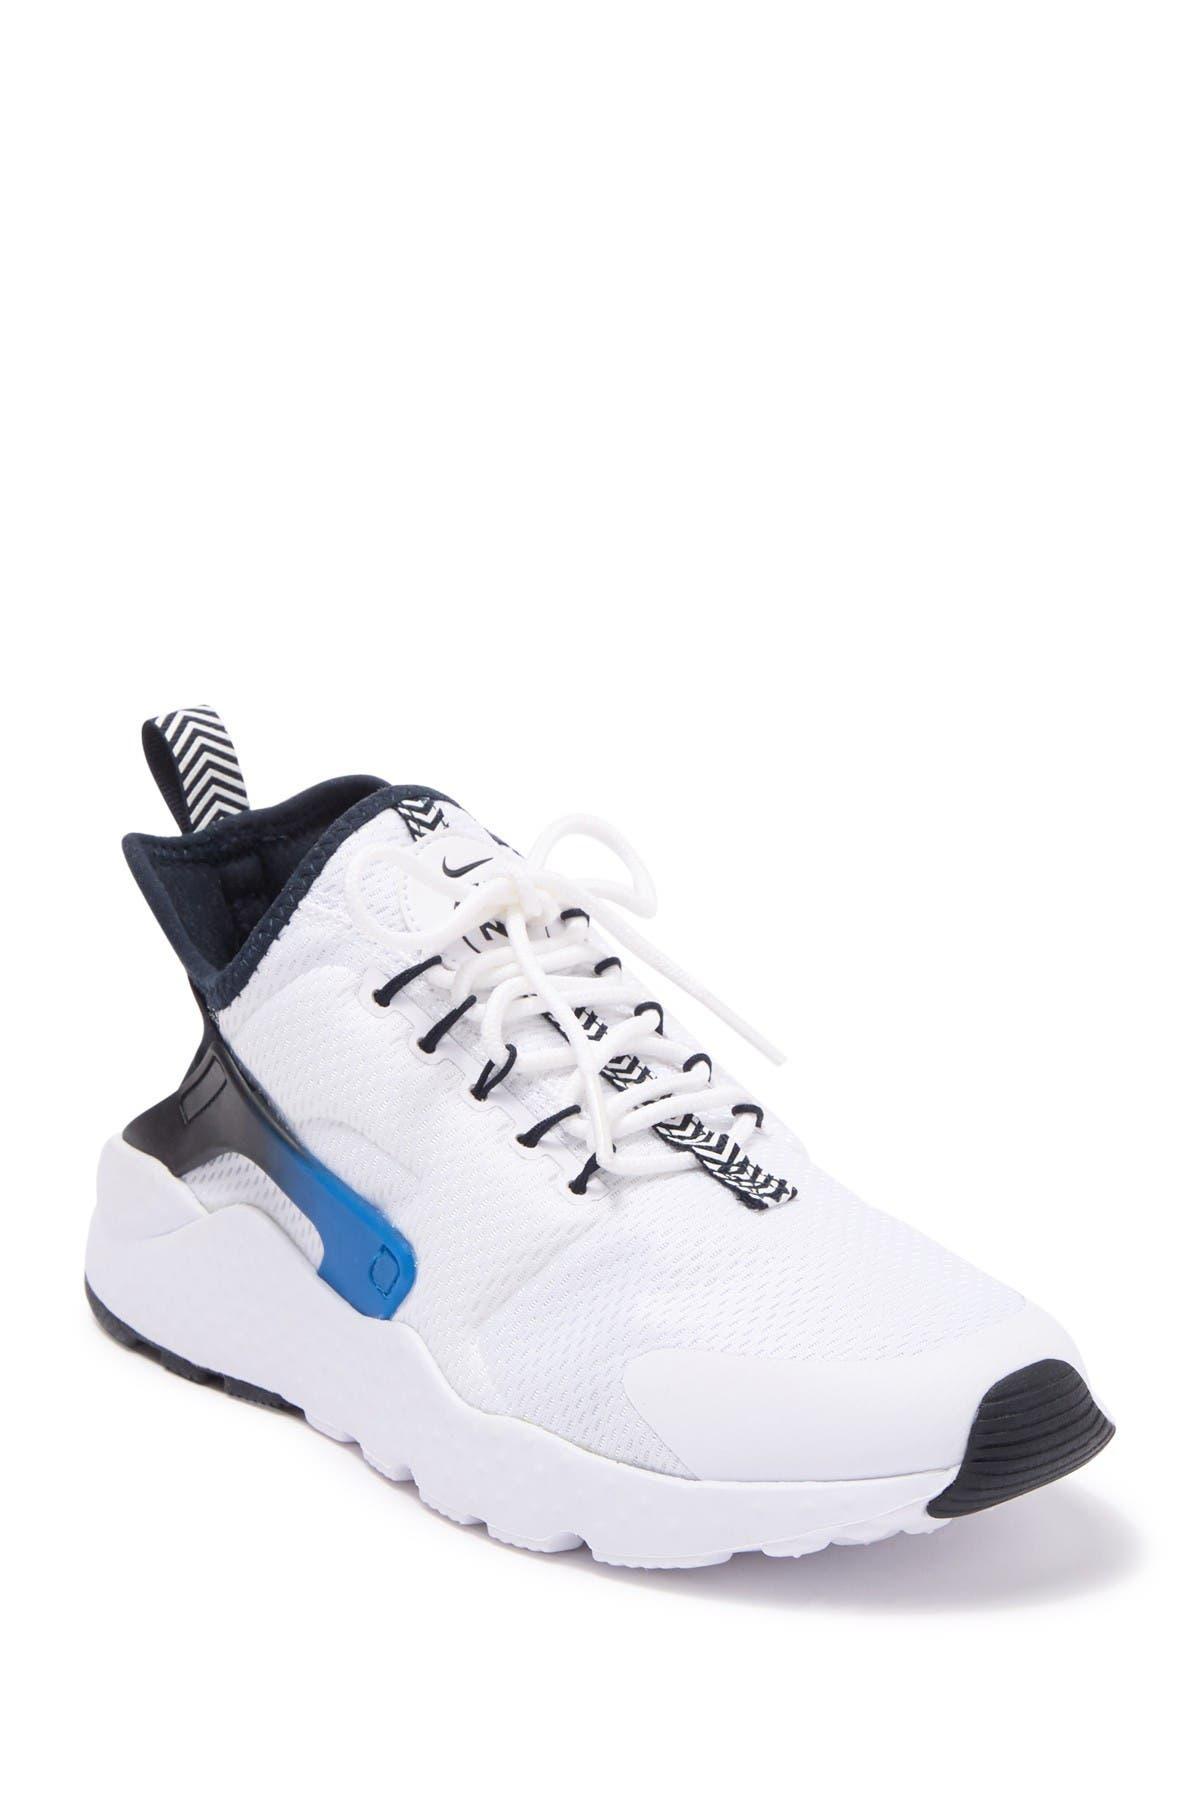 Nike   Air Huarache Run Ultra N7 Shoe